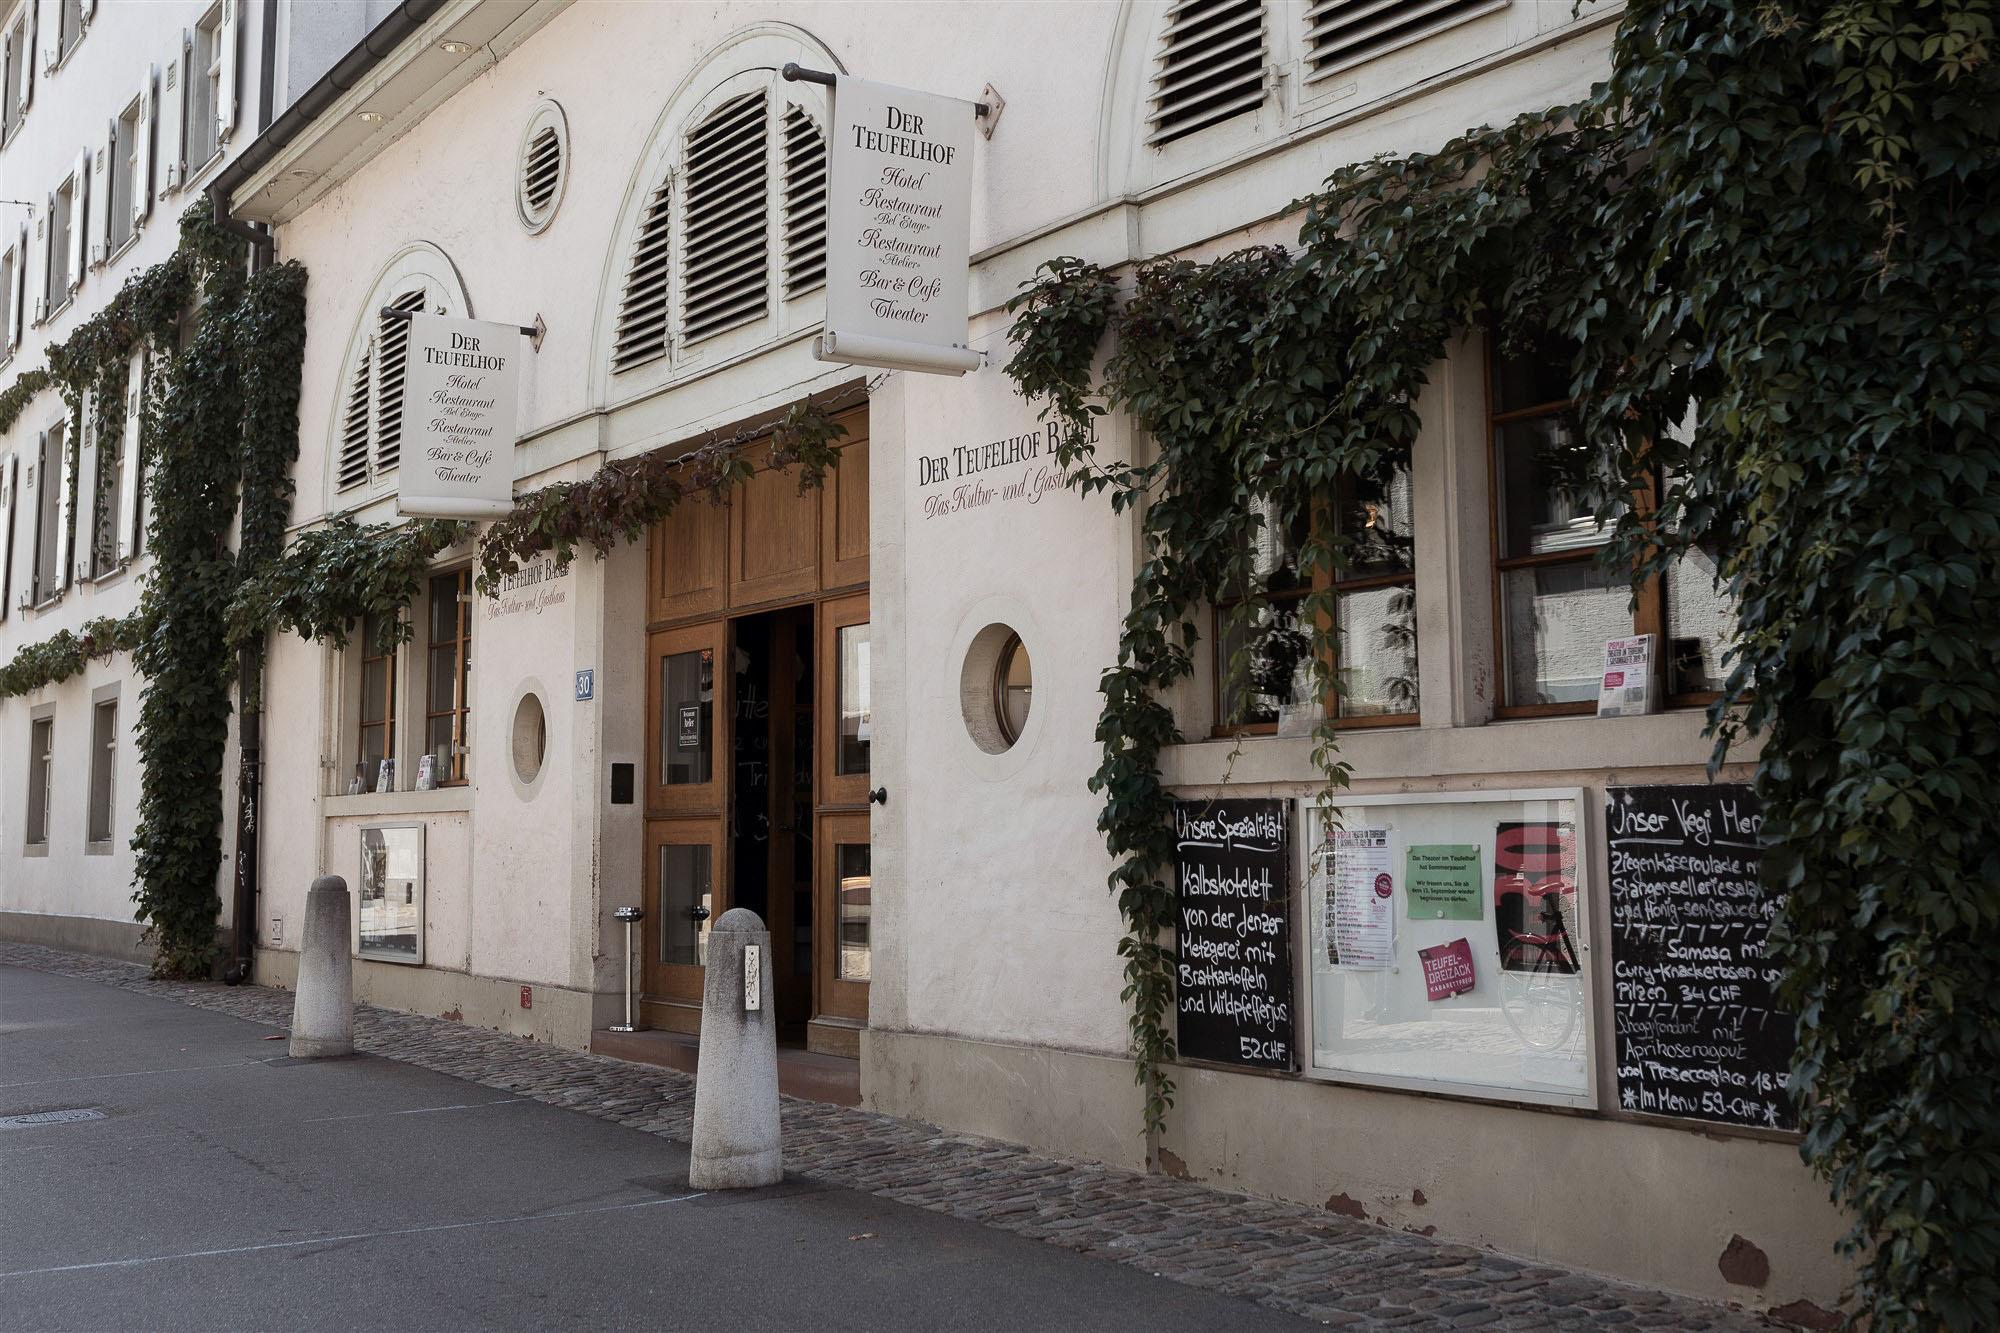 Hotel Restaurant Teufelhof in Basel